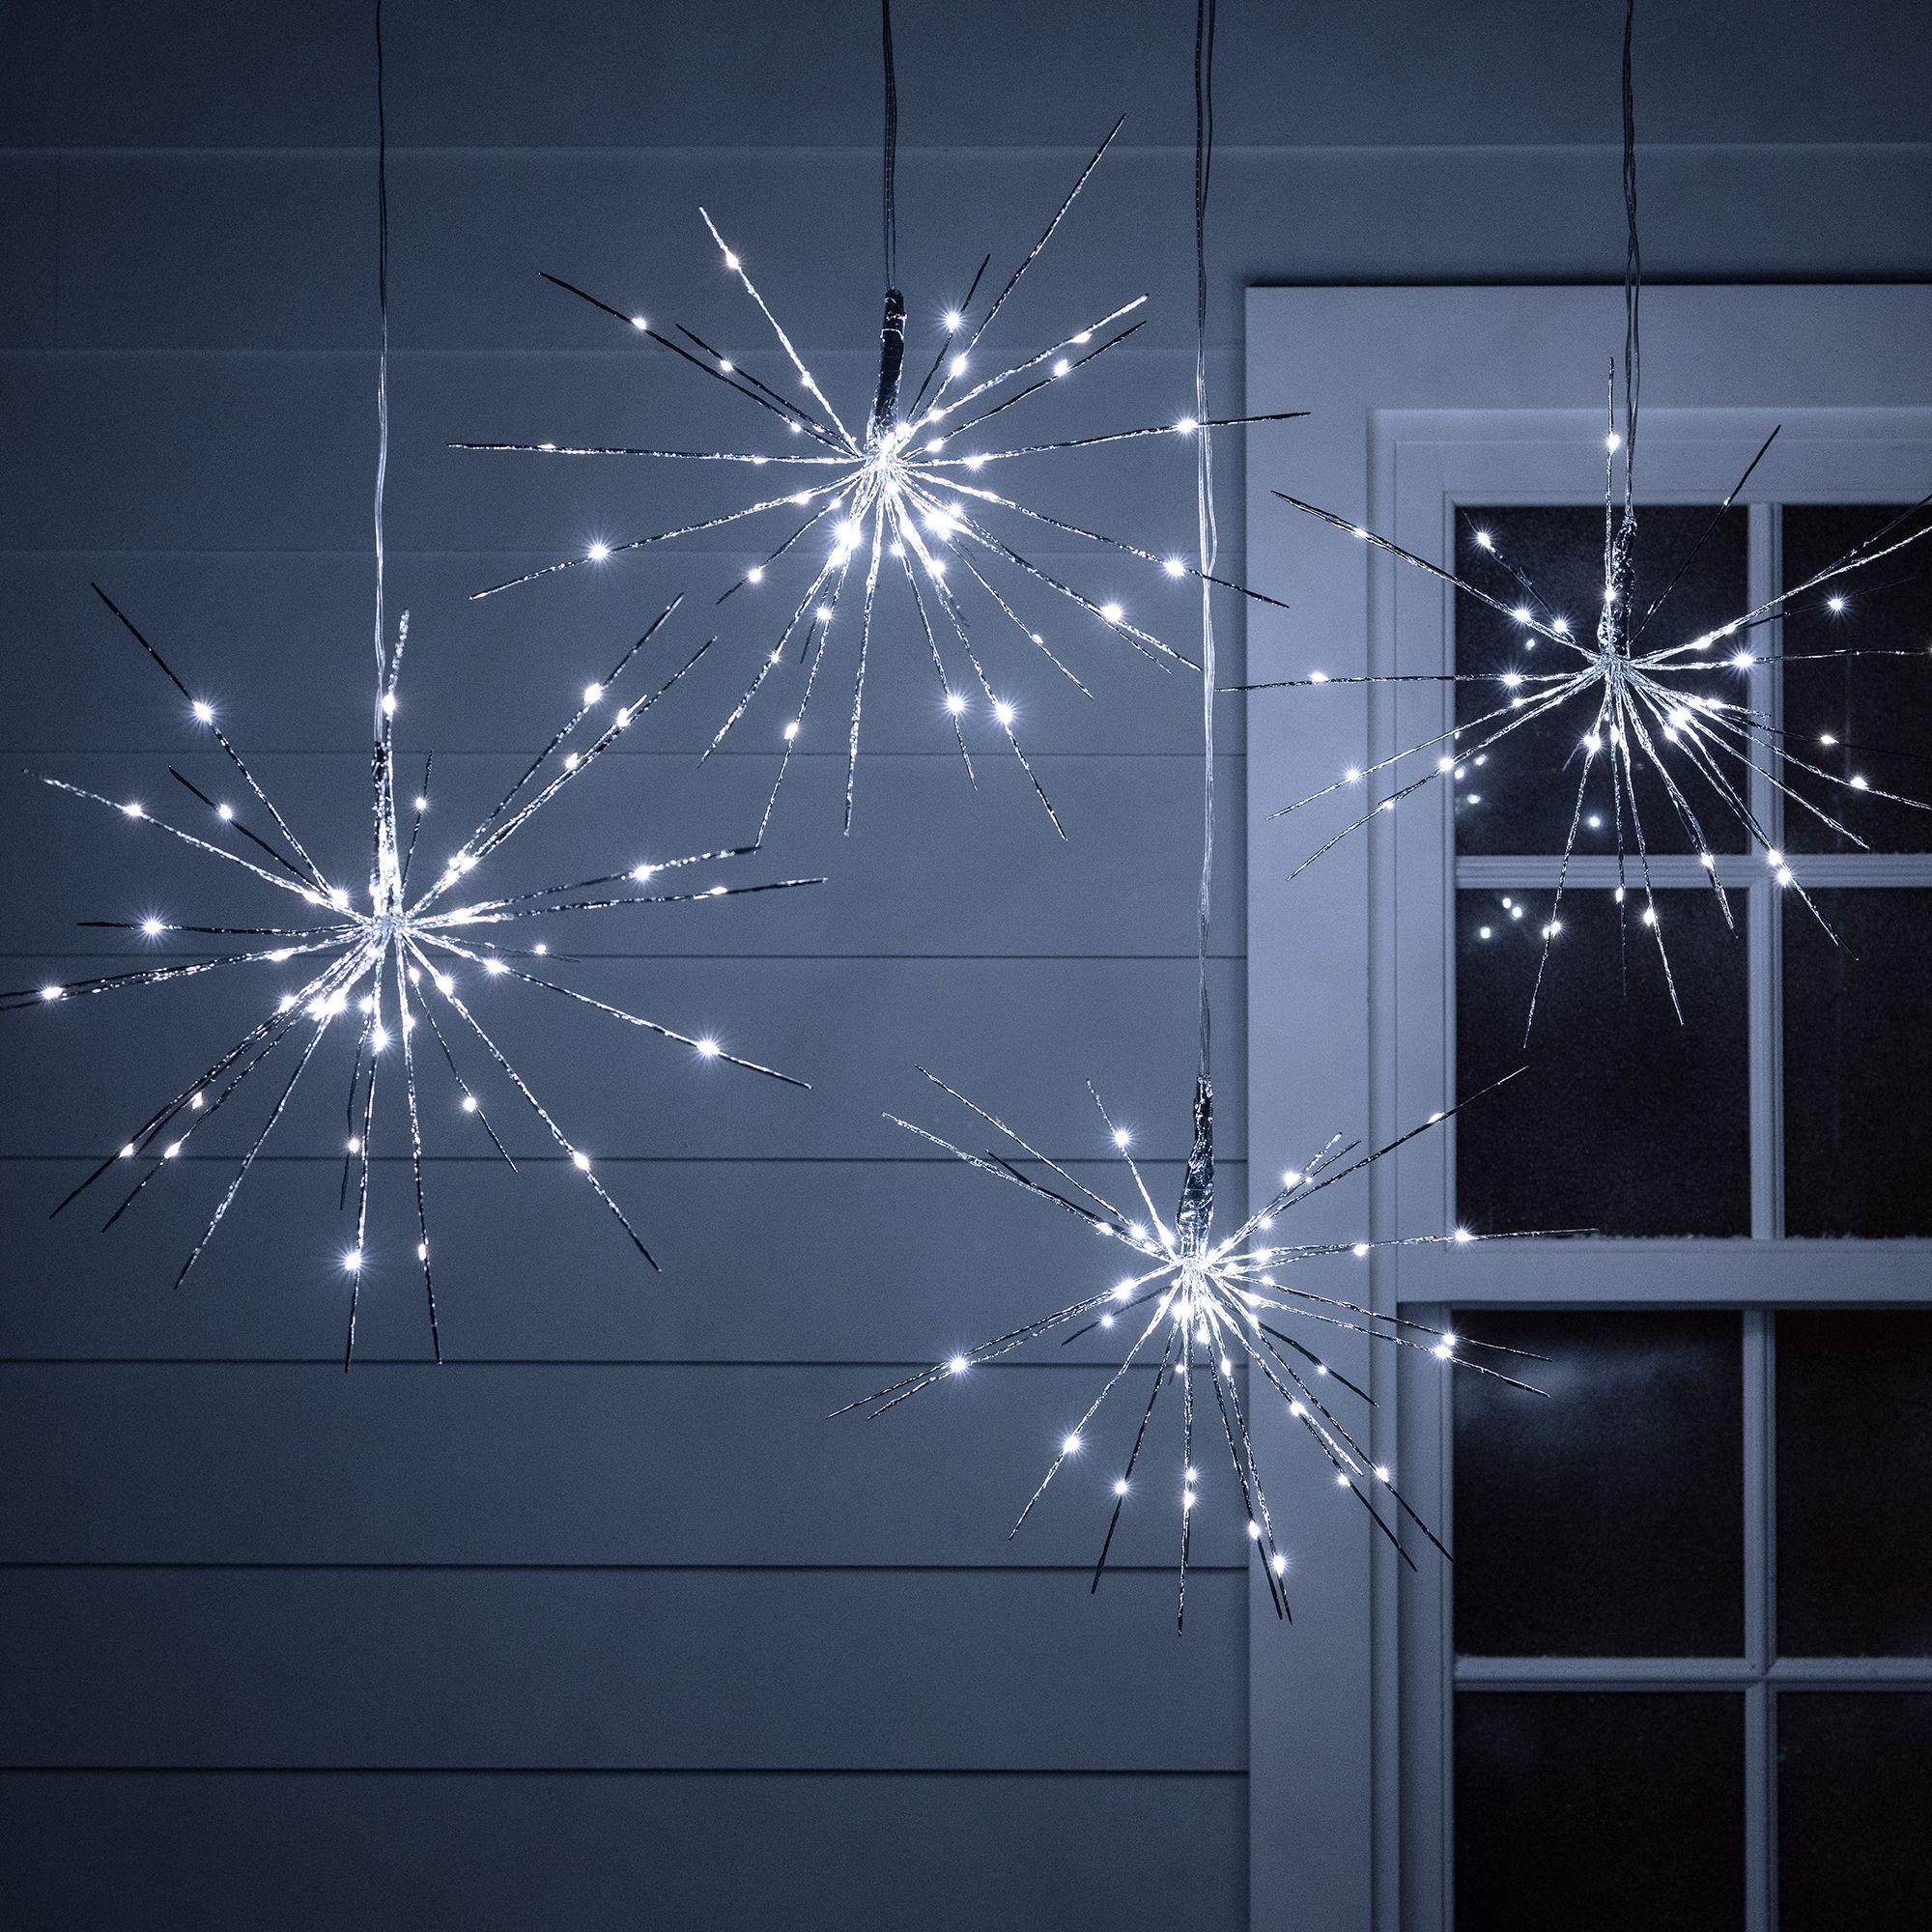 4 Silver Starburst Sparkling Christmas Lights Outdoor Christmas Lights Christmas Lights Indoor Christmas Lights